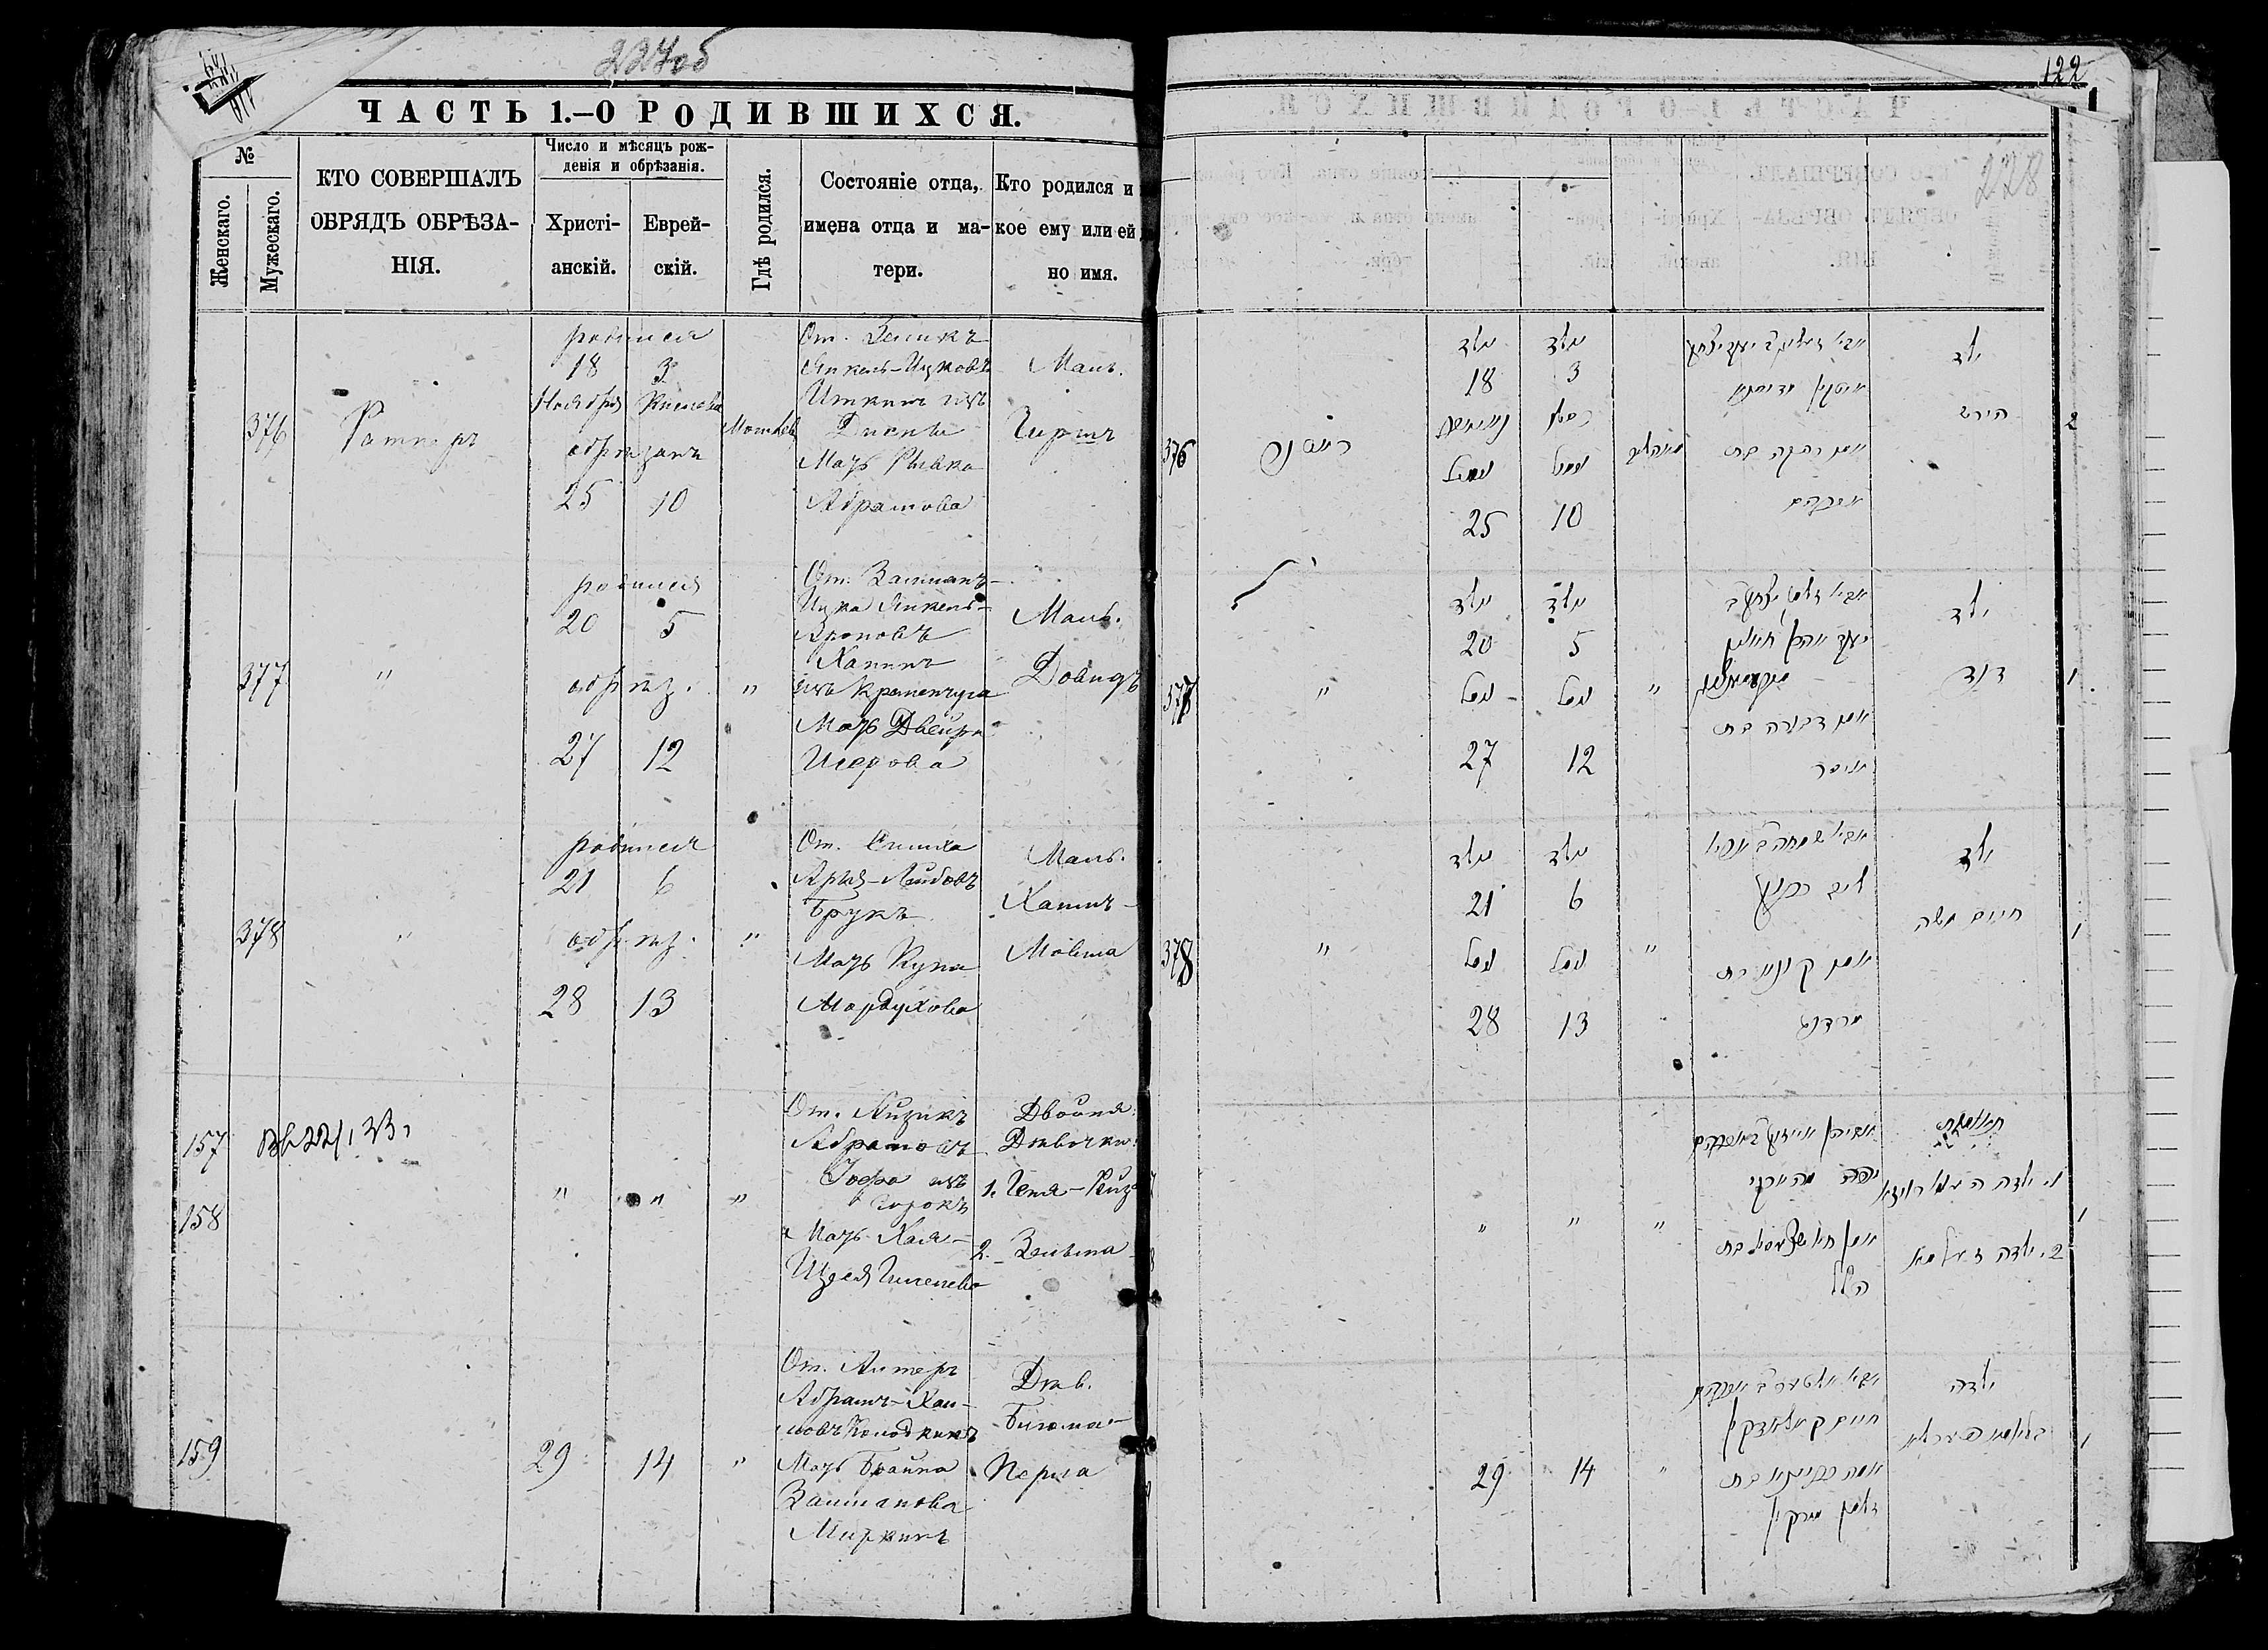 Блюма-Перла Колодкина 29 ноября 1886, запись 159, пленка 007766483, снимок 605